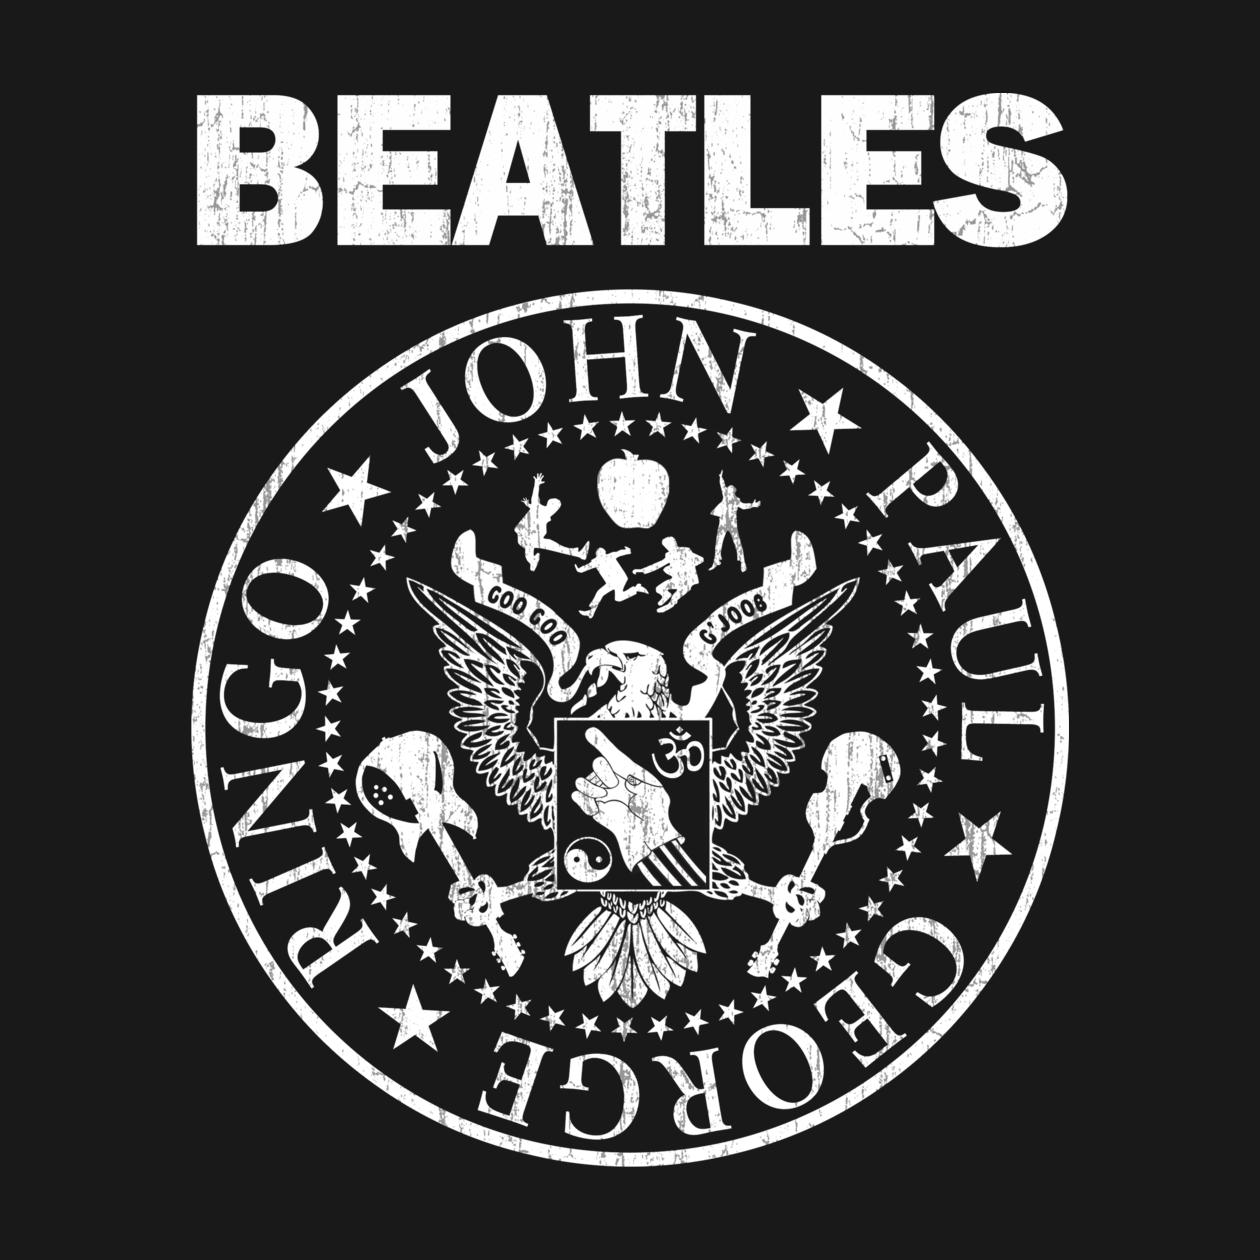 Beatle on the Brat by everyplatewebreak